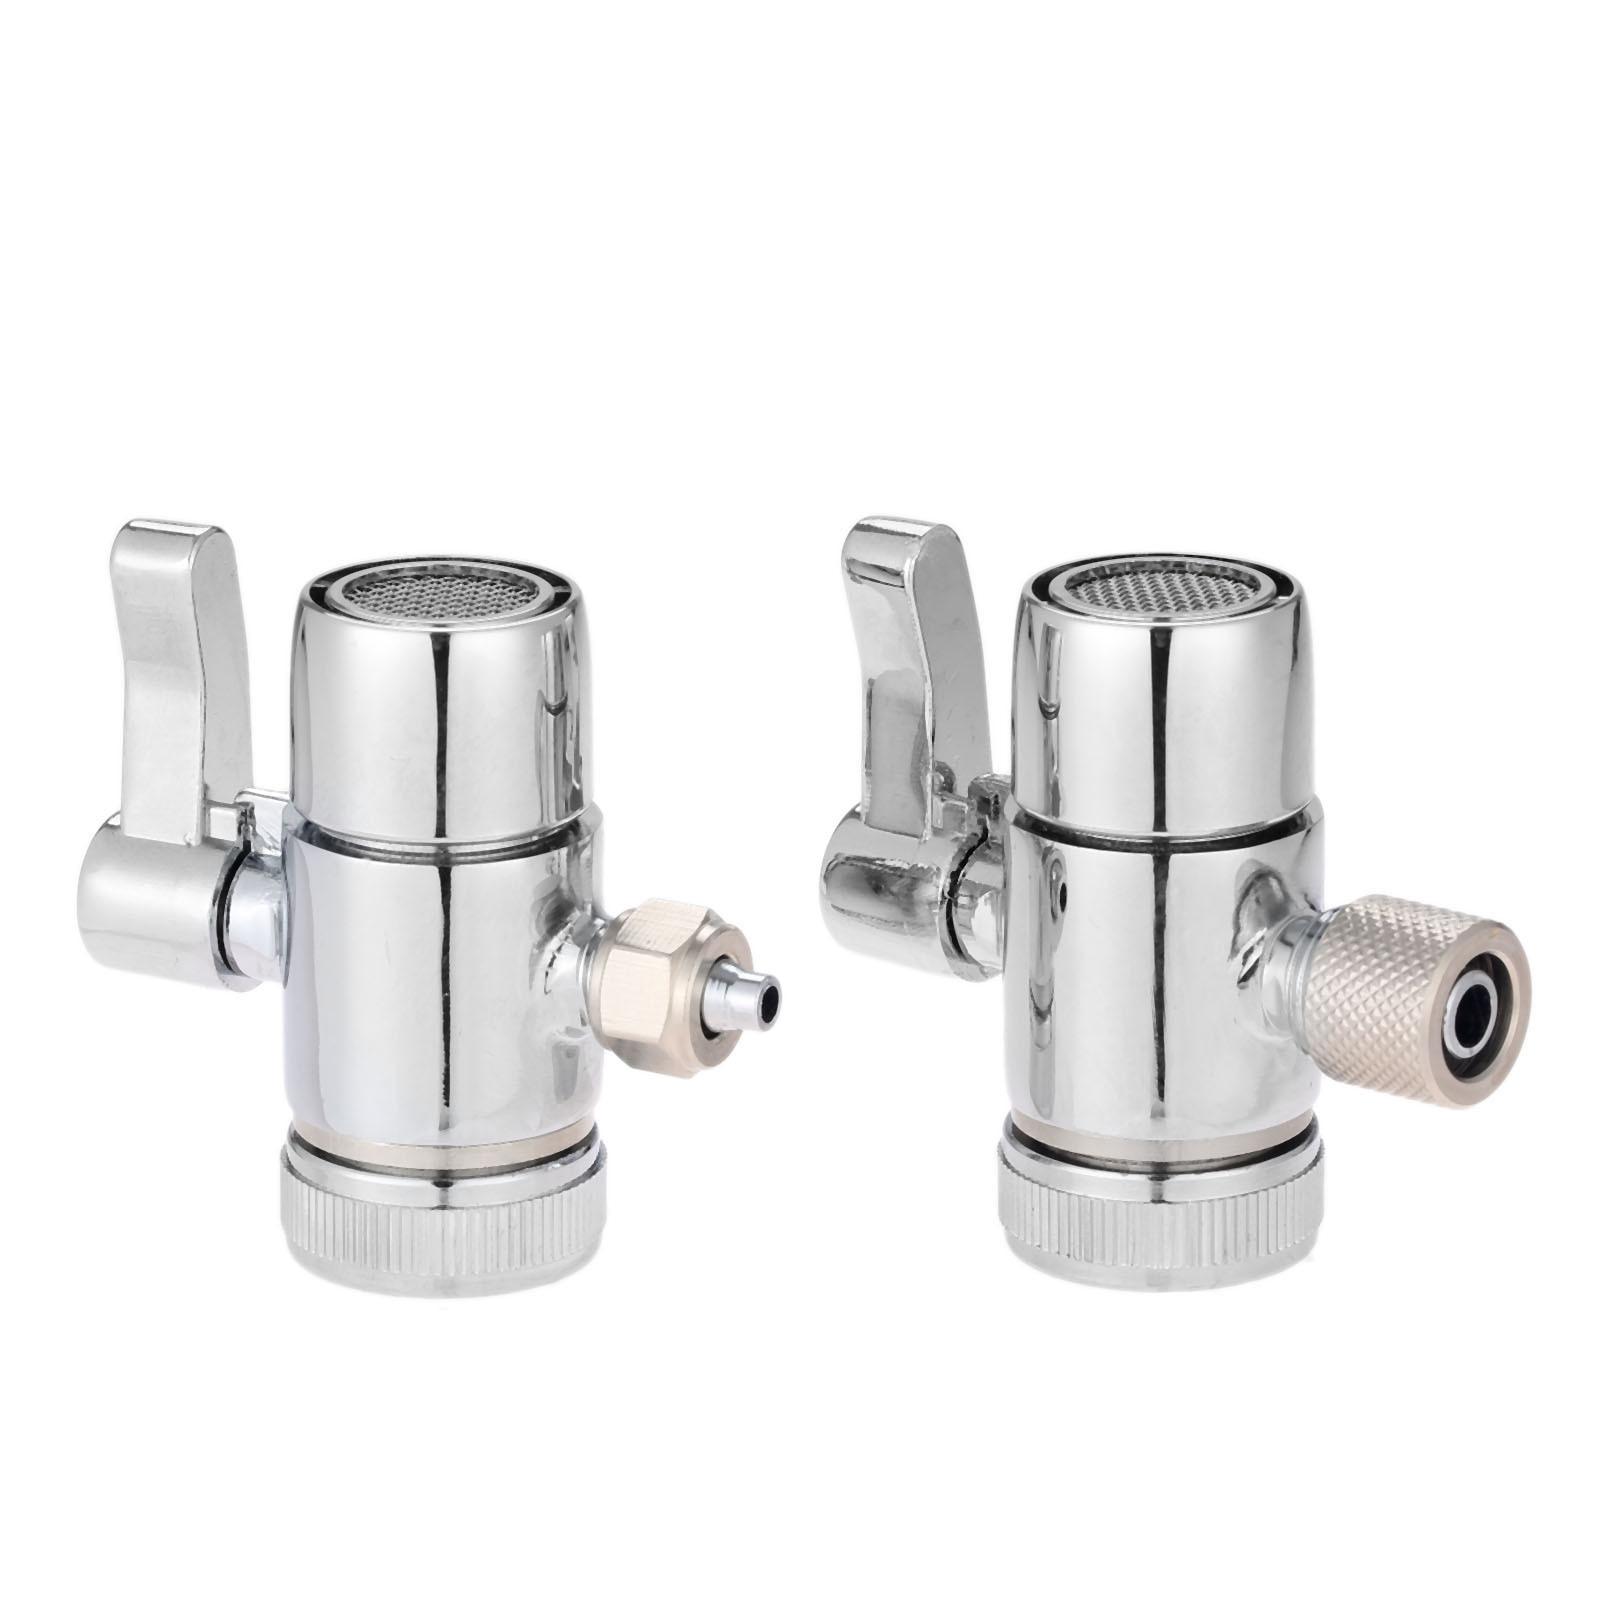 Stainless Steel Faucet Adapter Diverter Valve Countertop Water Filter 1//4